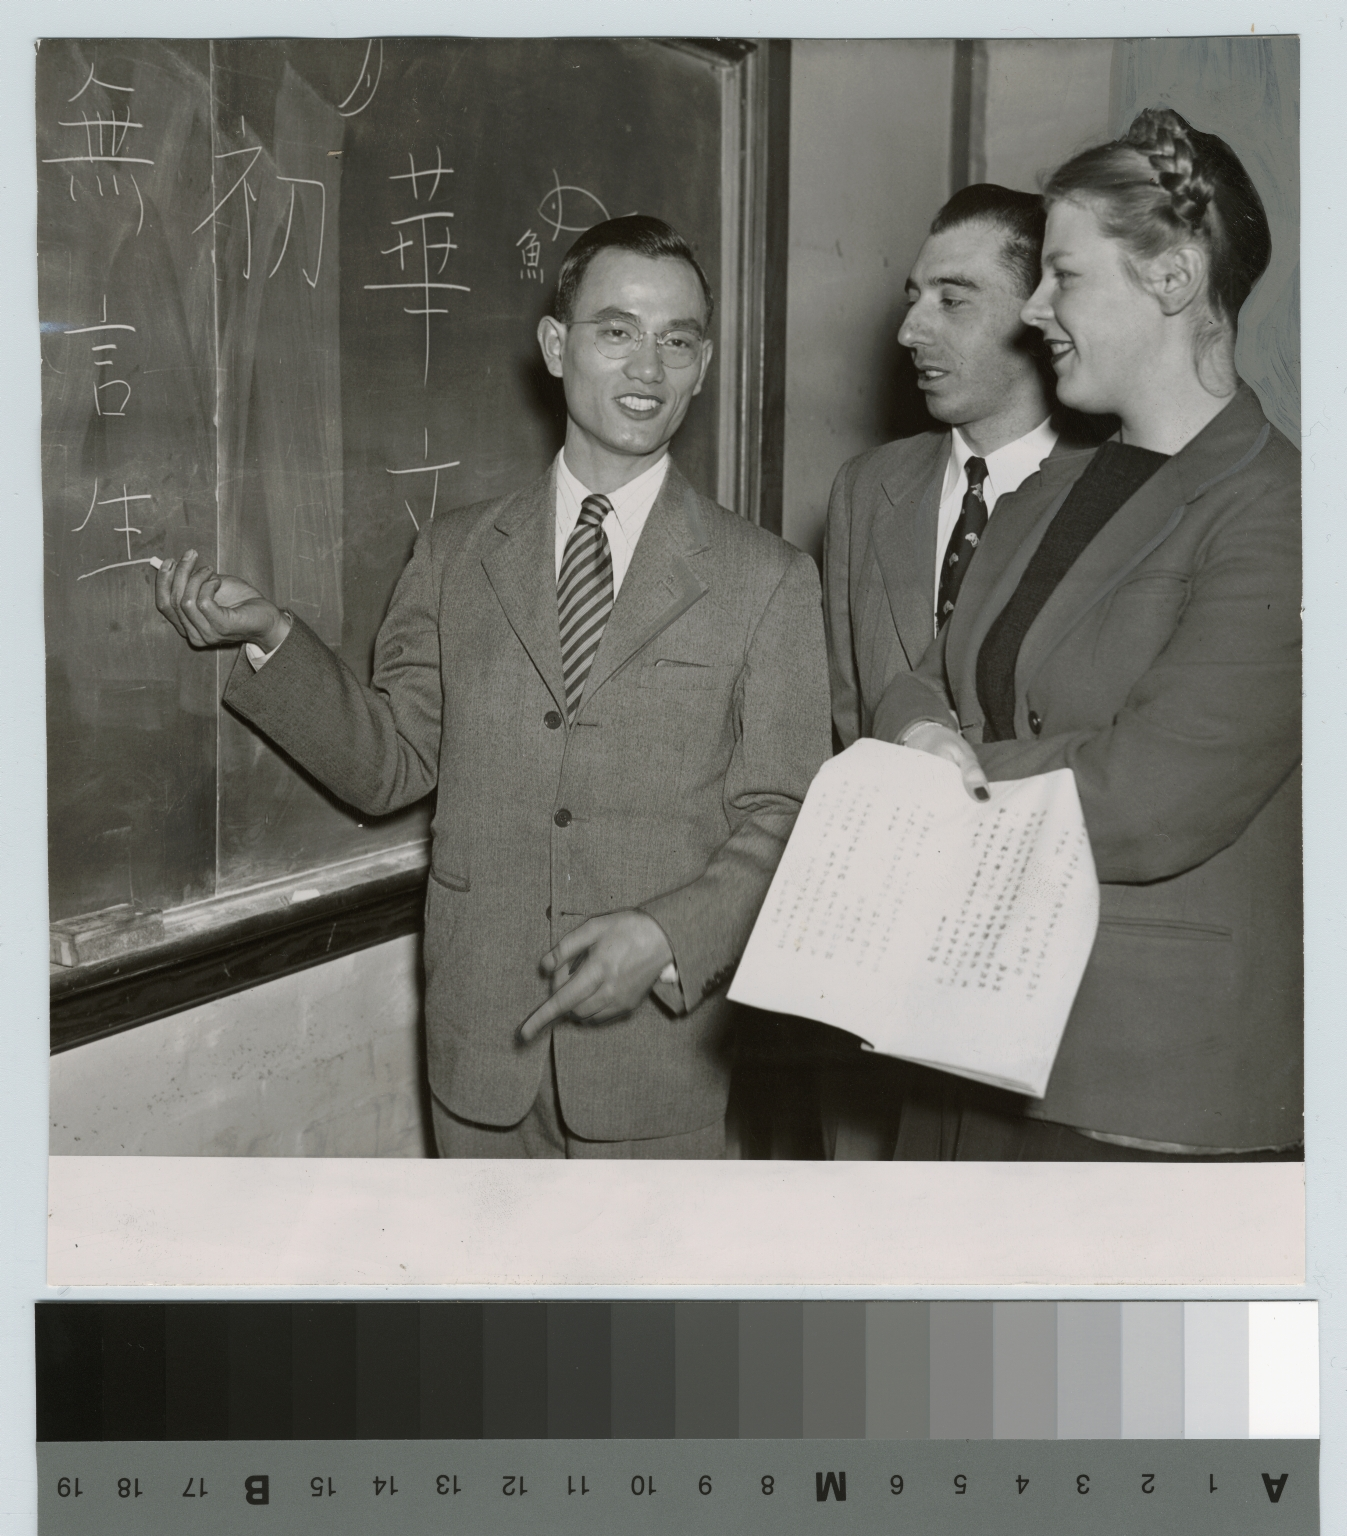 Evening school Chinese class, Rochester Athenaeum and Mechanics Institute [1944]